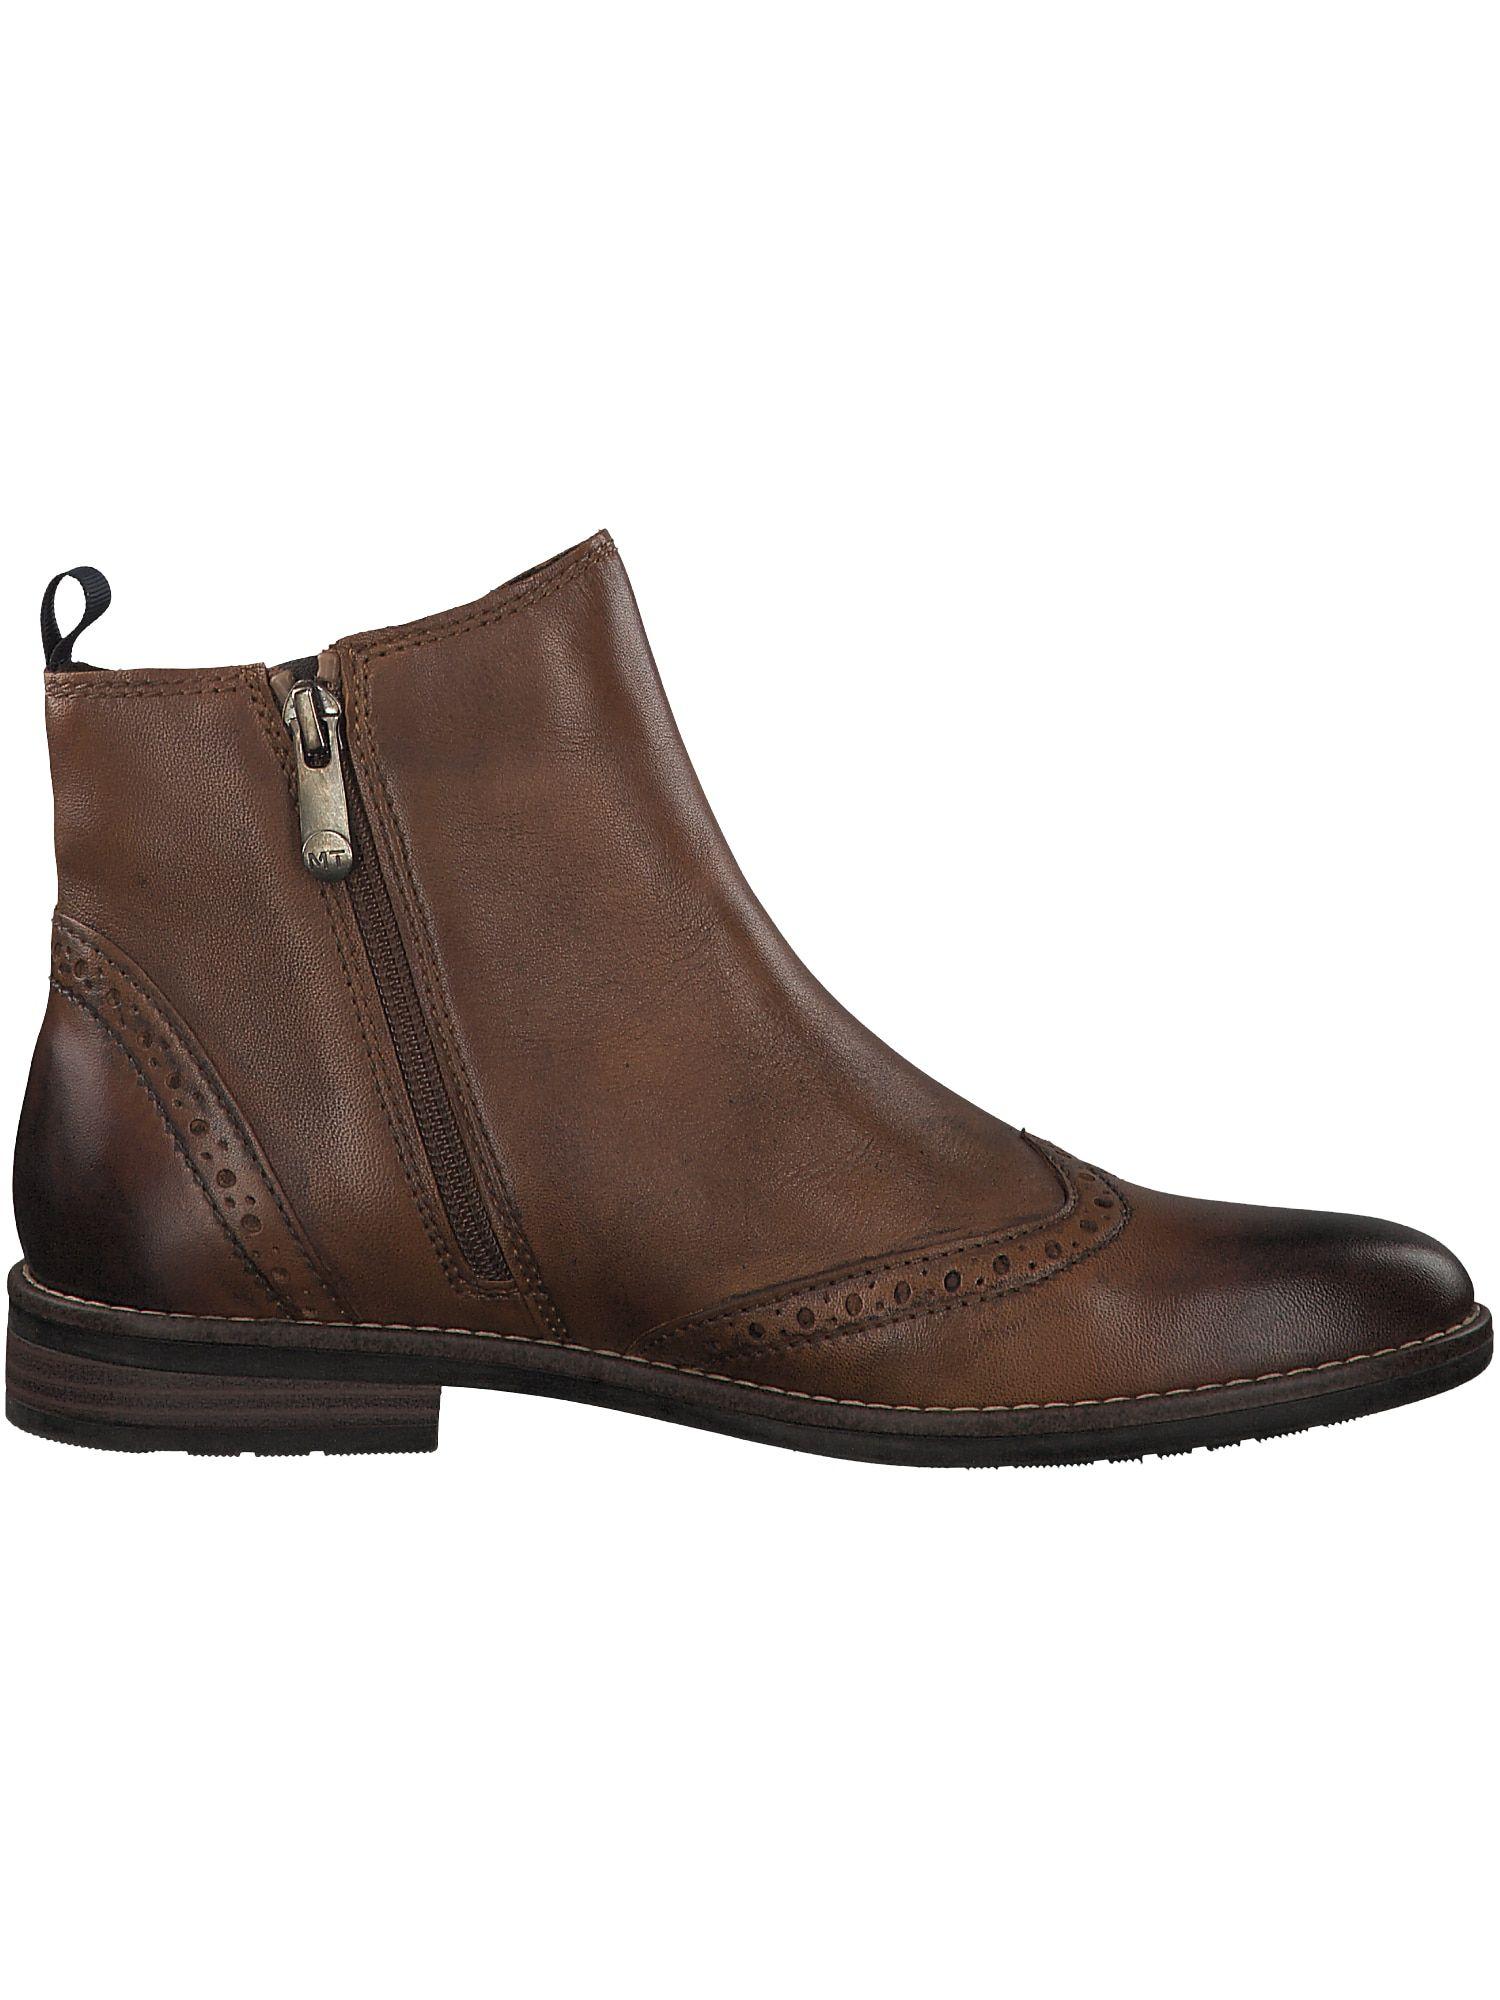 MARCO TOZZI Chelsea Boots Damen, Braun, Größe 39   Chelsea